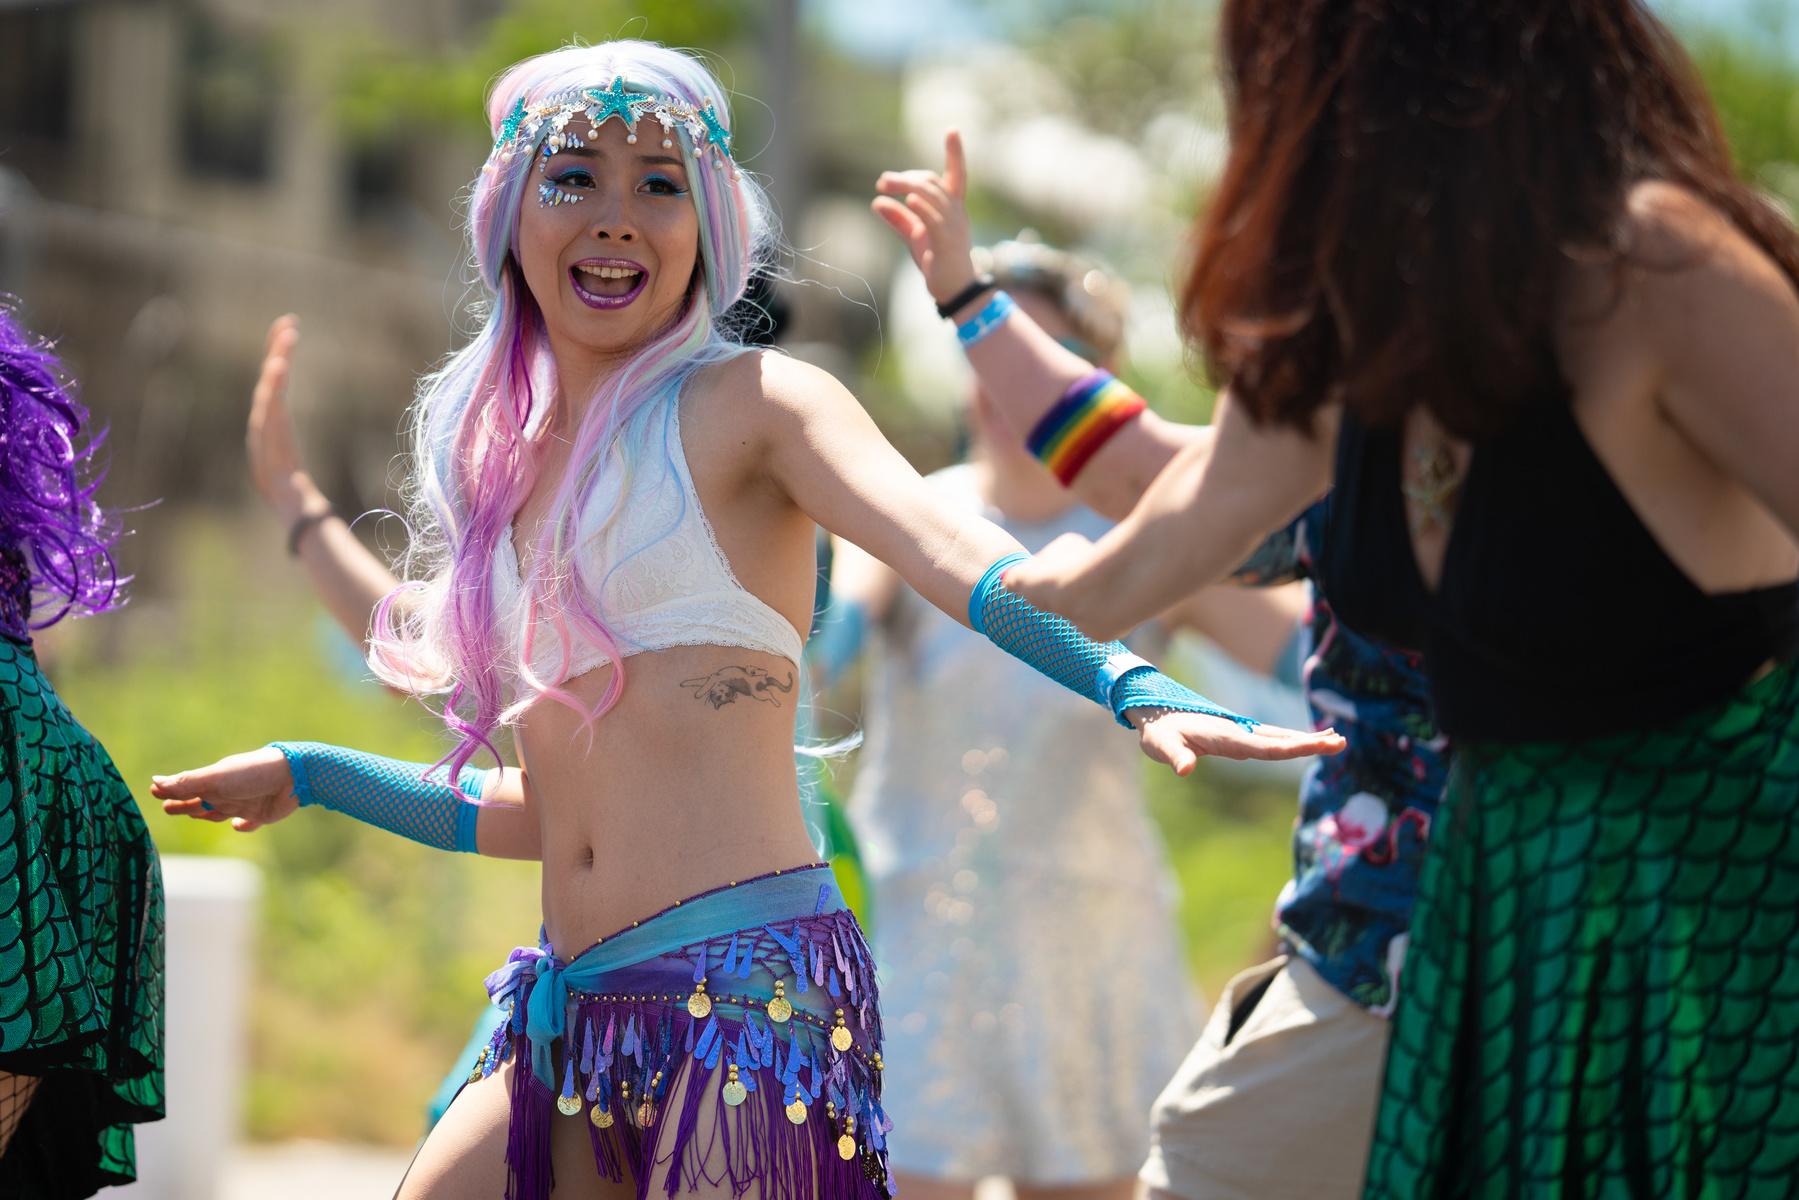 Coney Island Mermaid Parade 2018 (36).jpeg